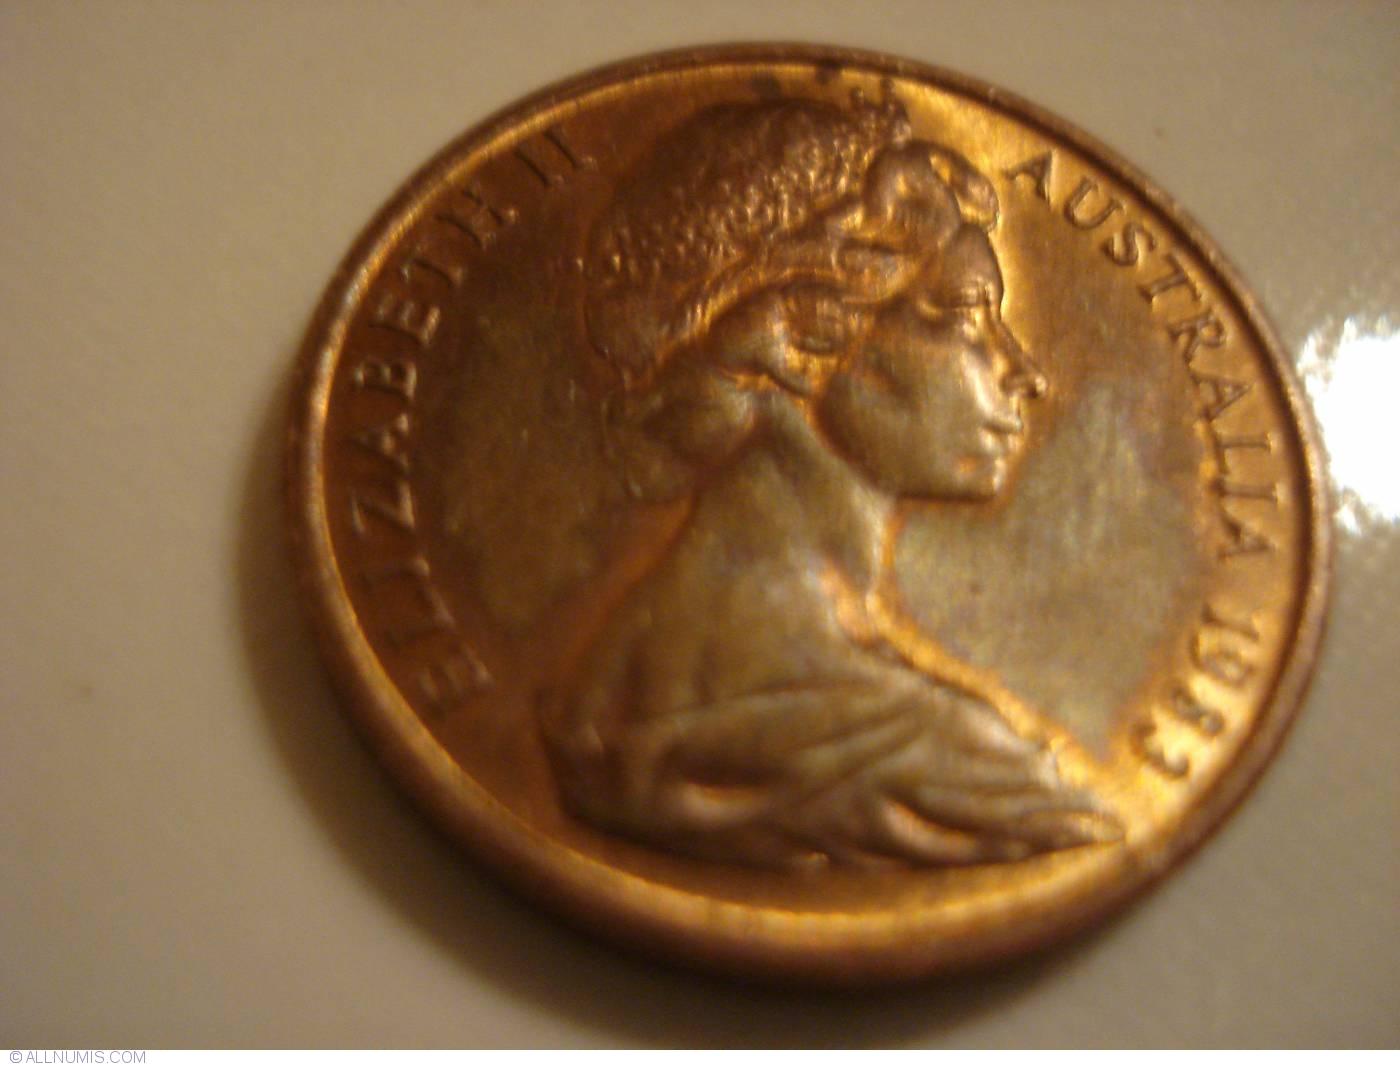 1983 Australia 1 Cent /& 2 Cent Uncirculated Coins Elizabeth II  in 2 x 2 Holder